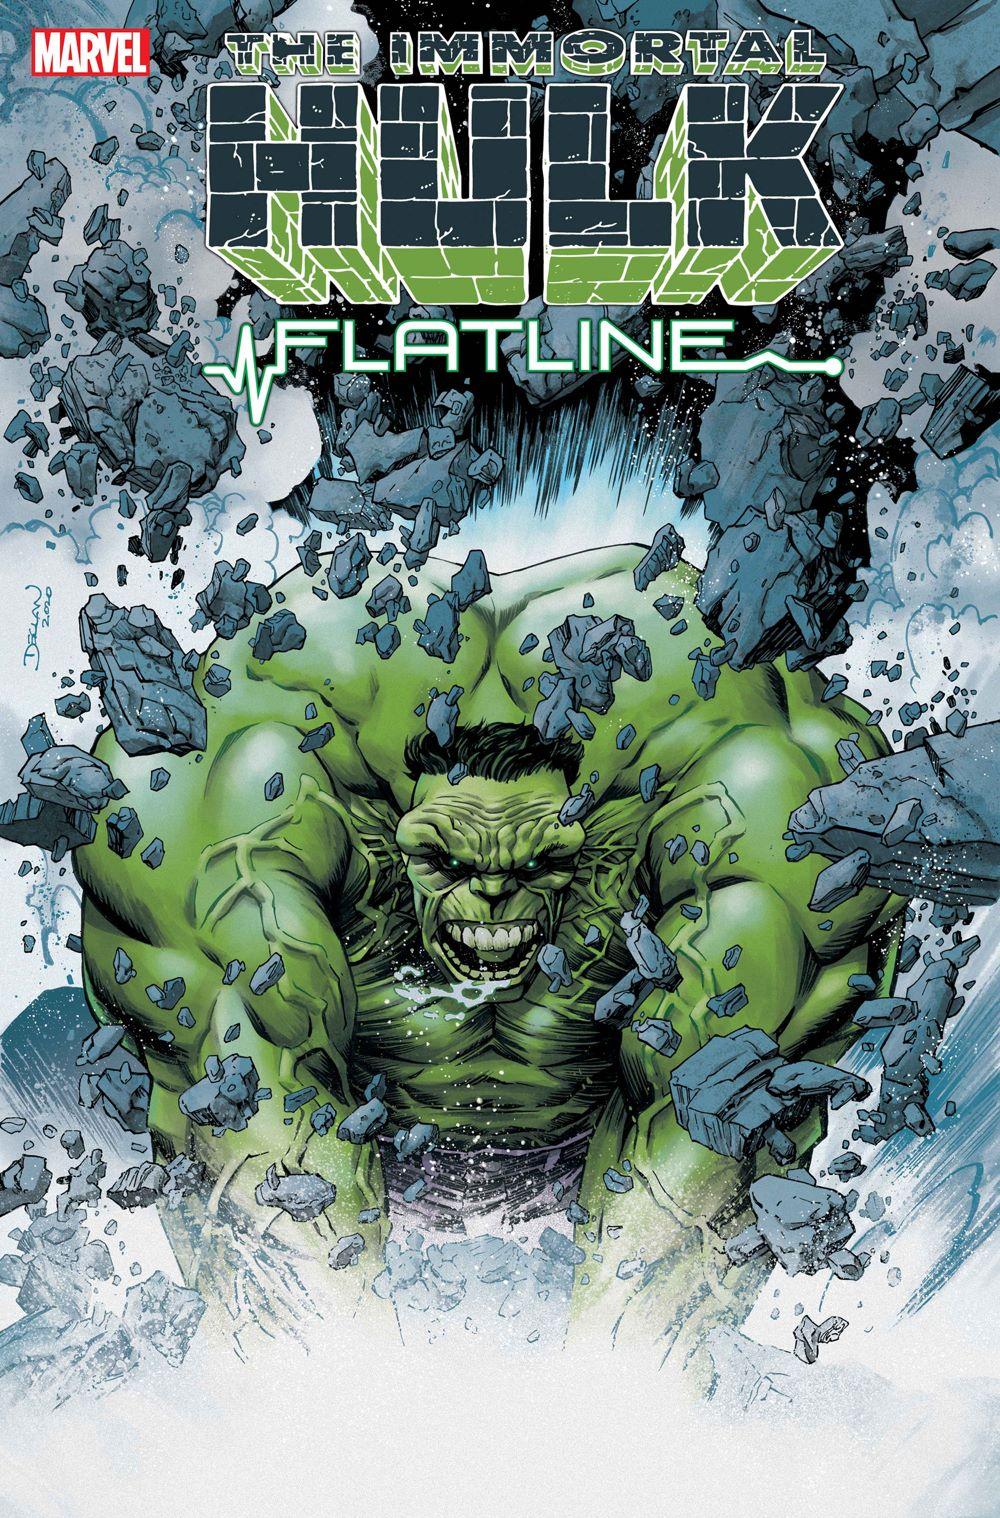 HULK2021_FLATLINE_Shalvey-1 Marvel Comics January 2021 Solicitations